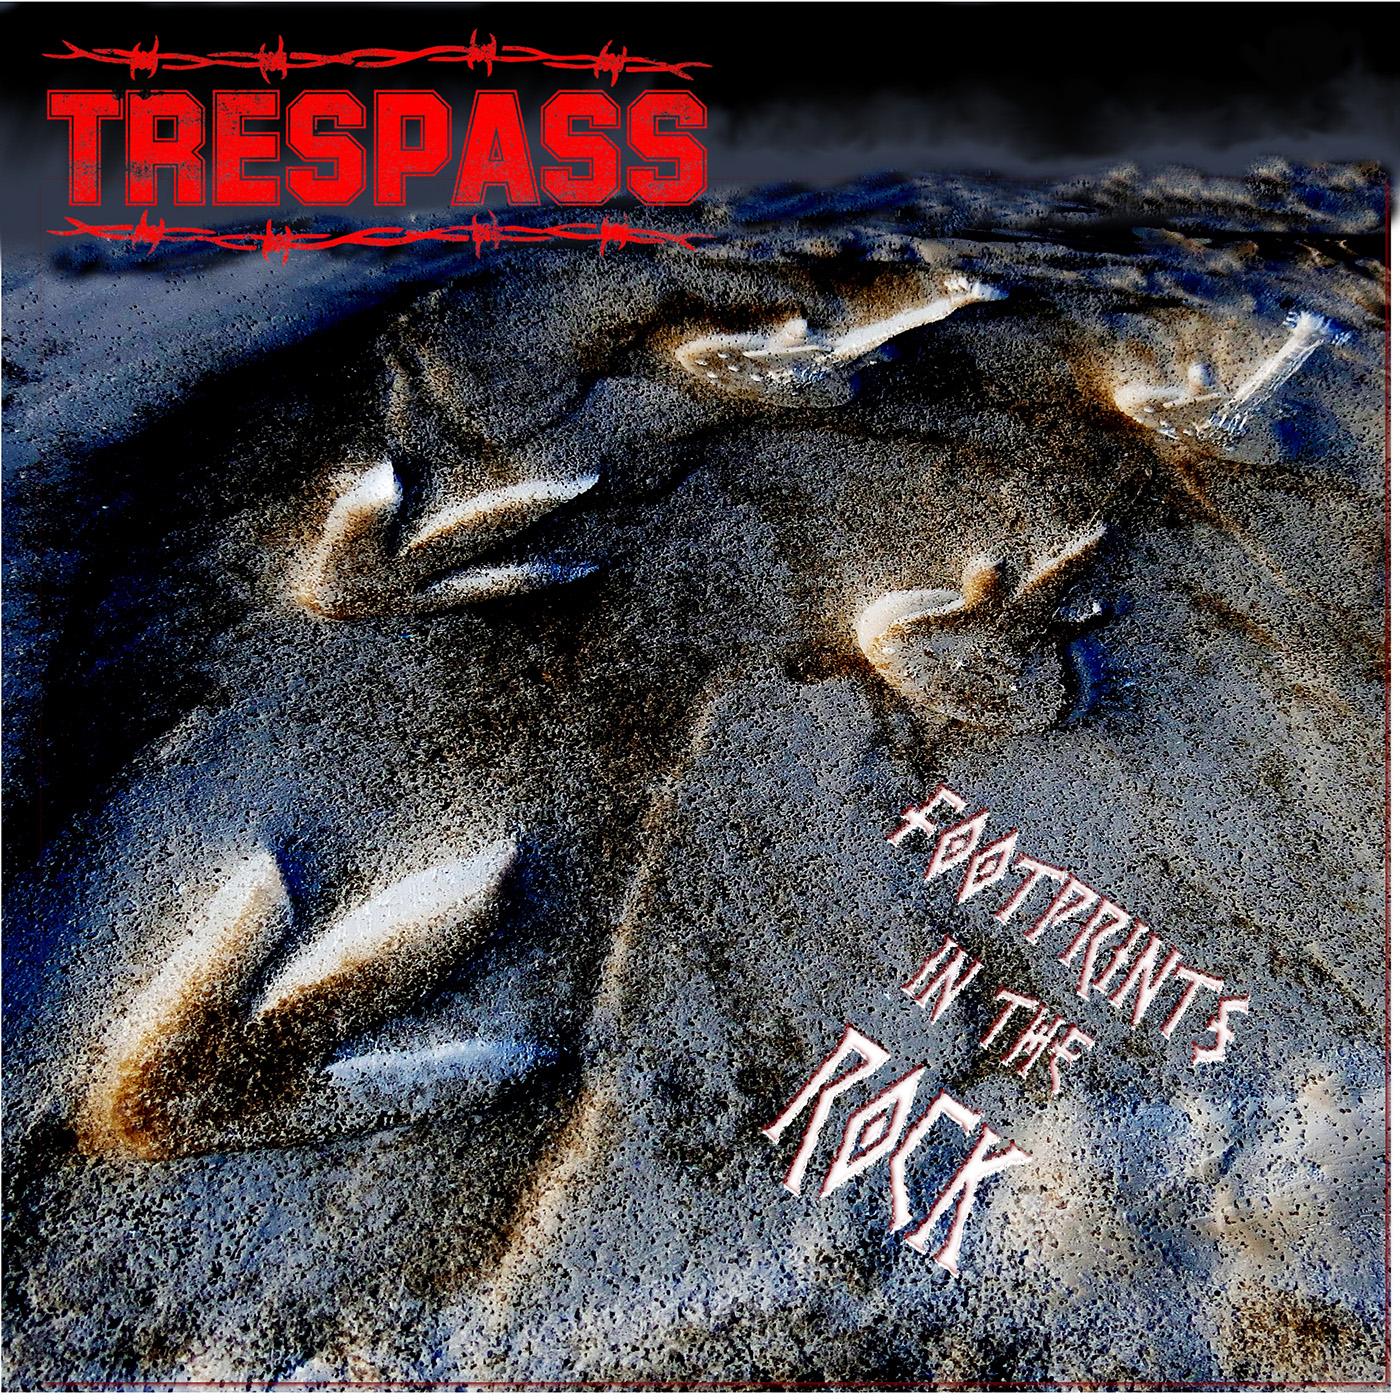 Trespass - Footprints In The Rock (album cover)1400x1400